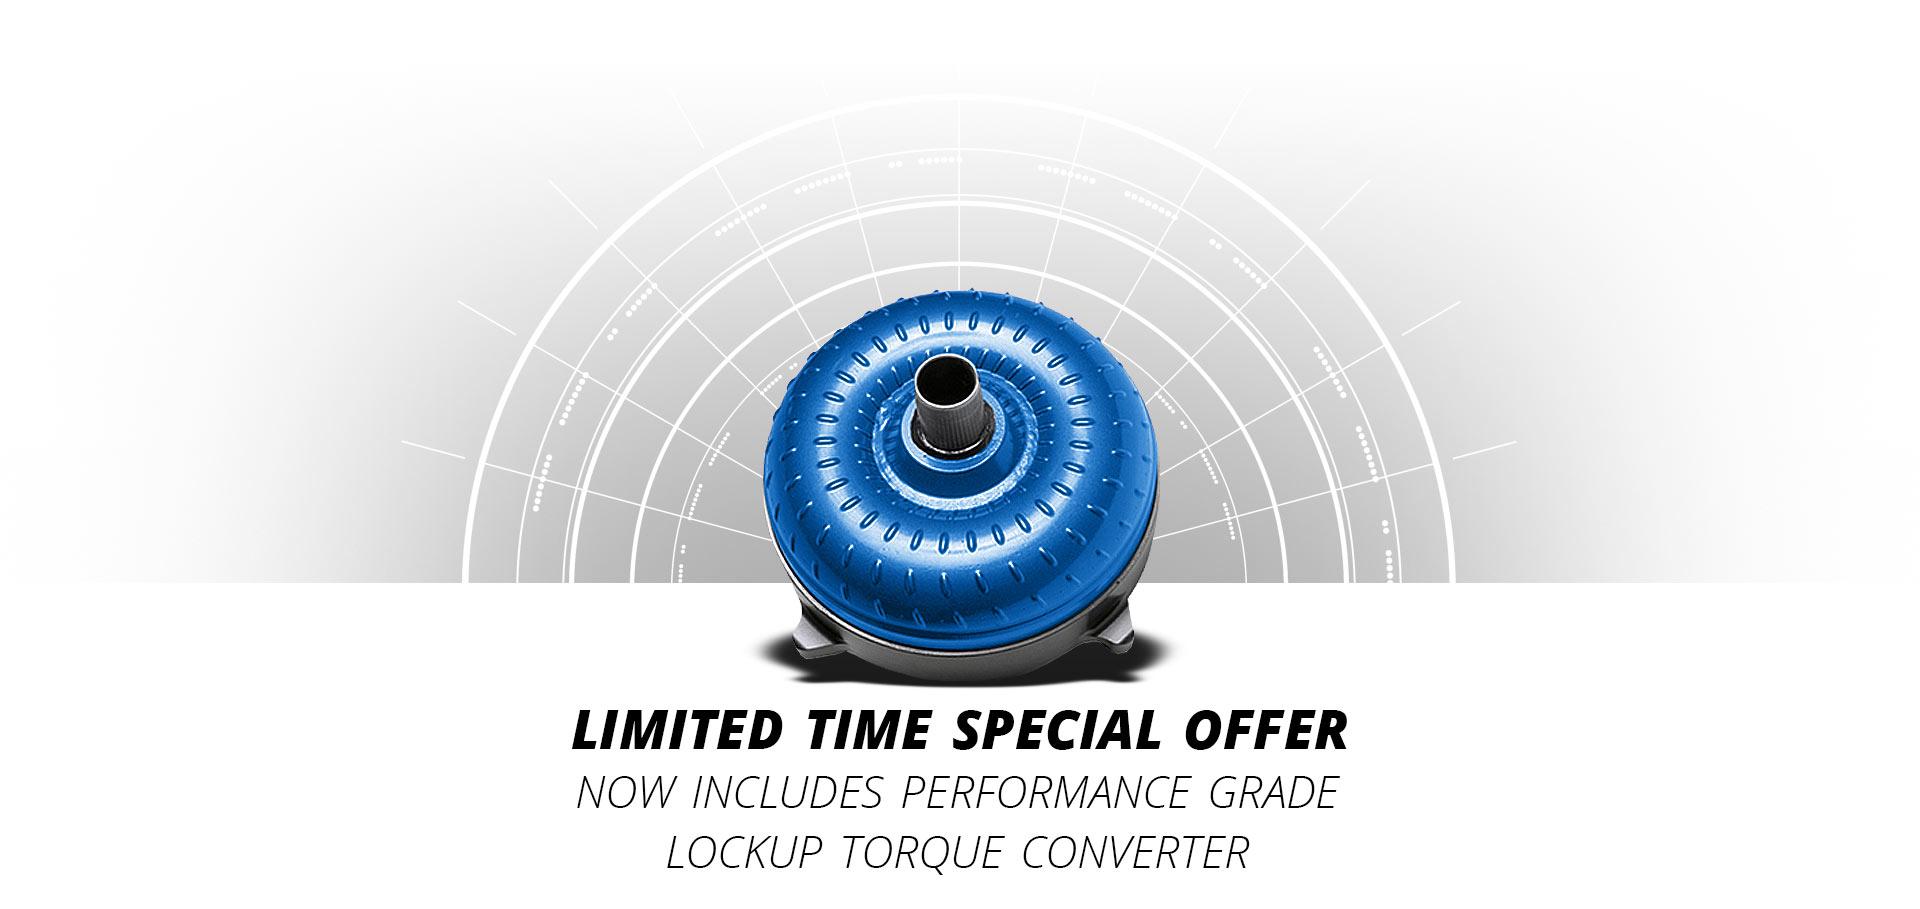 Performance 44RE Lockup Torque Converter